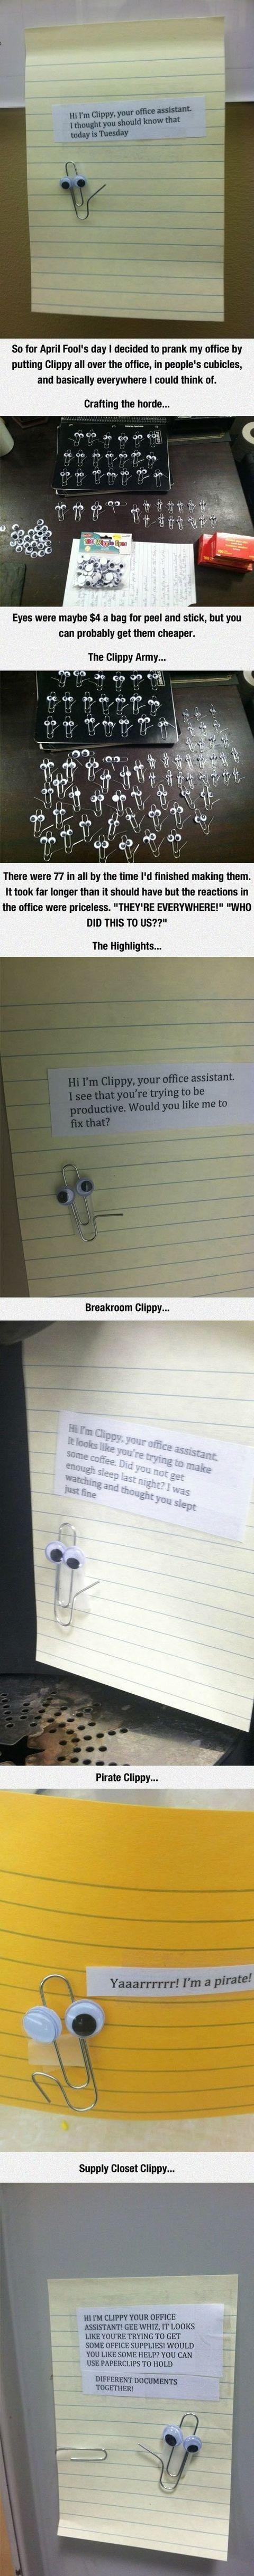 The Clippy Prank